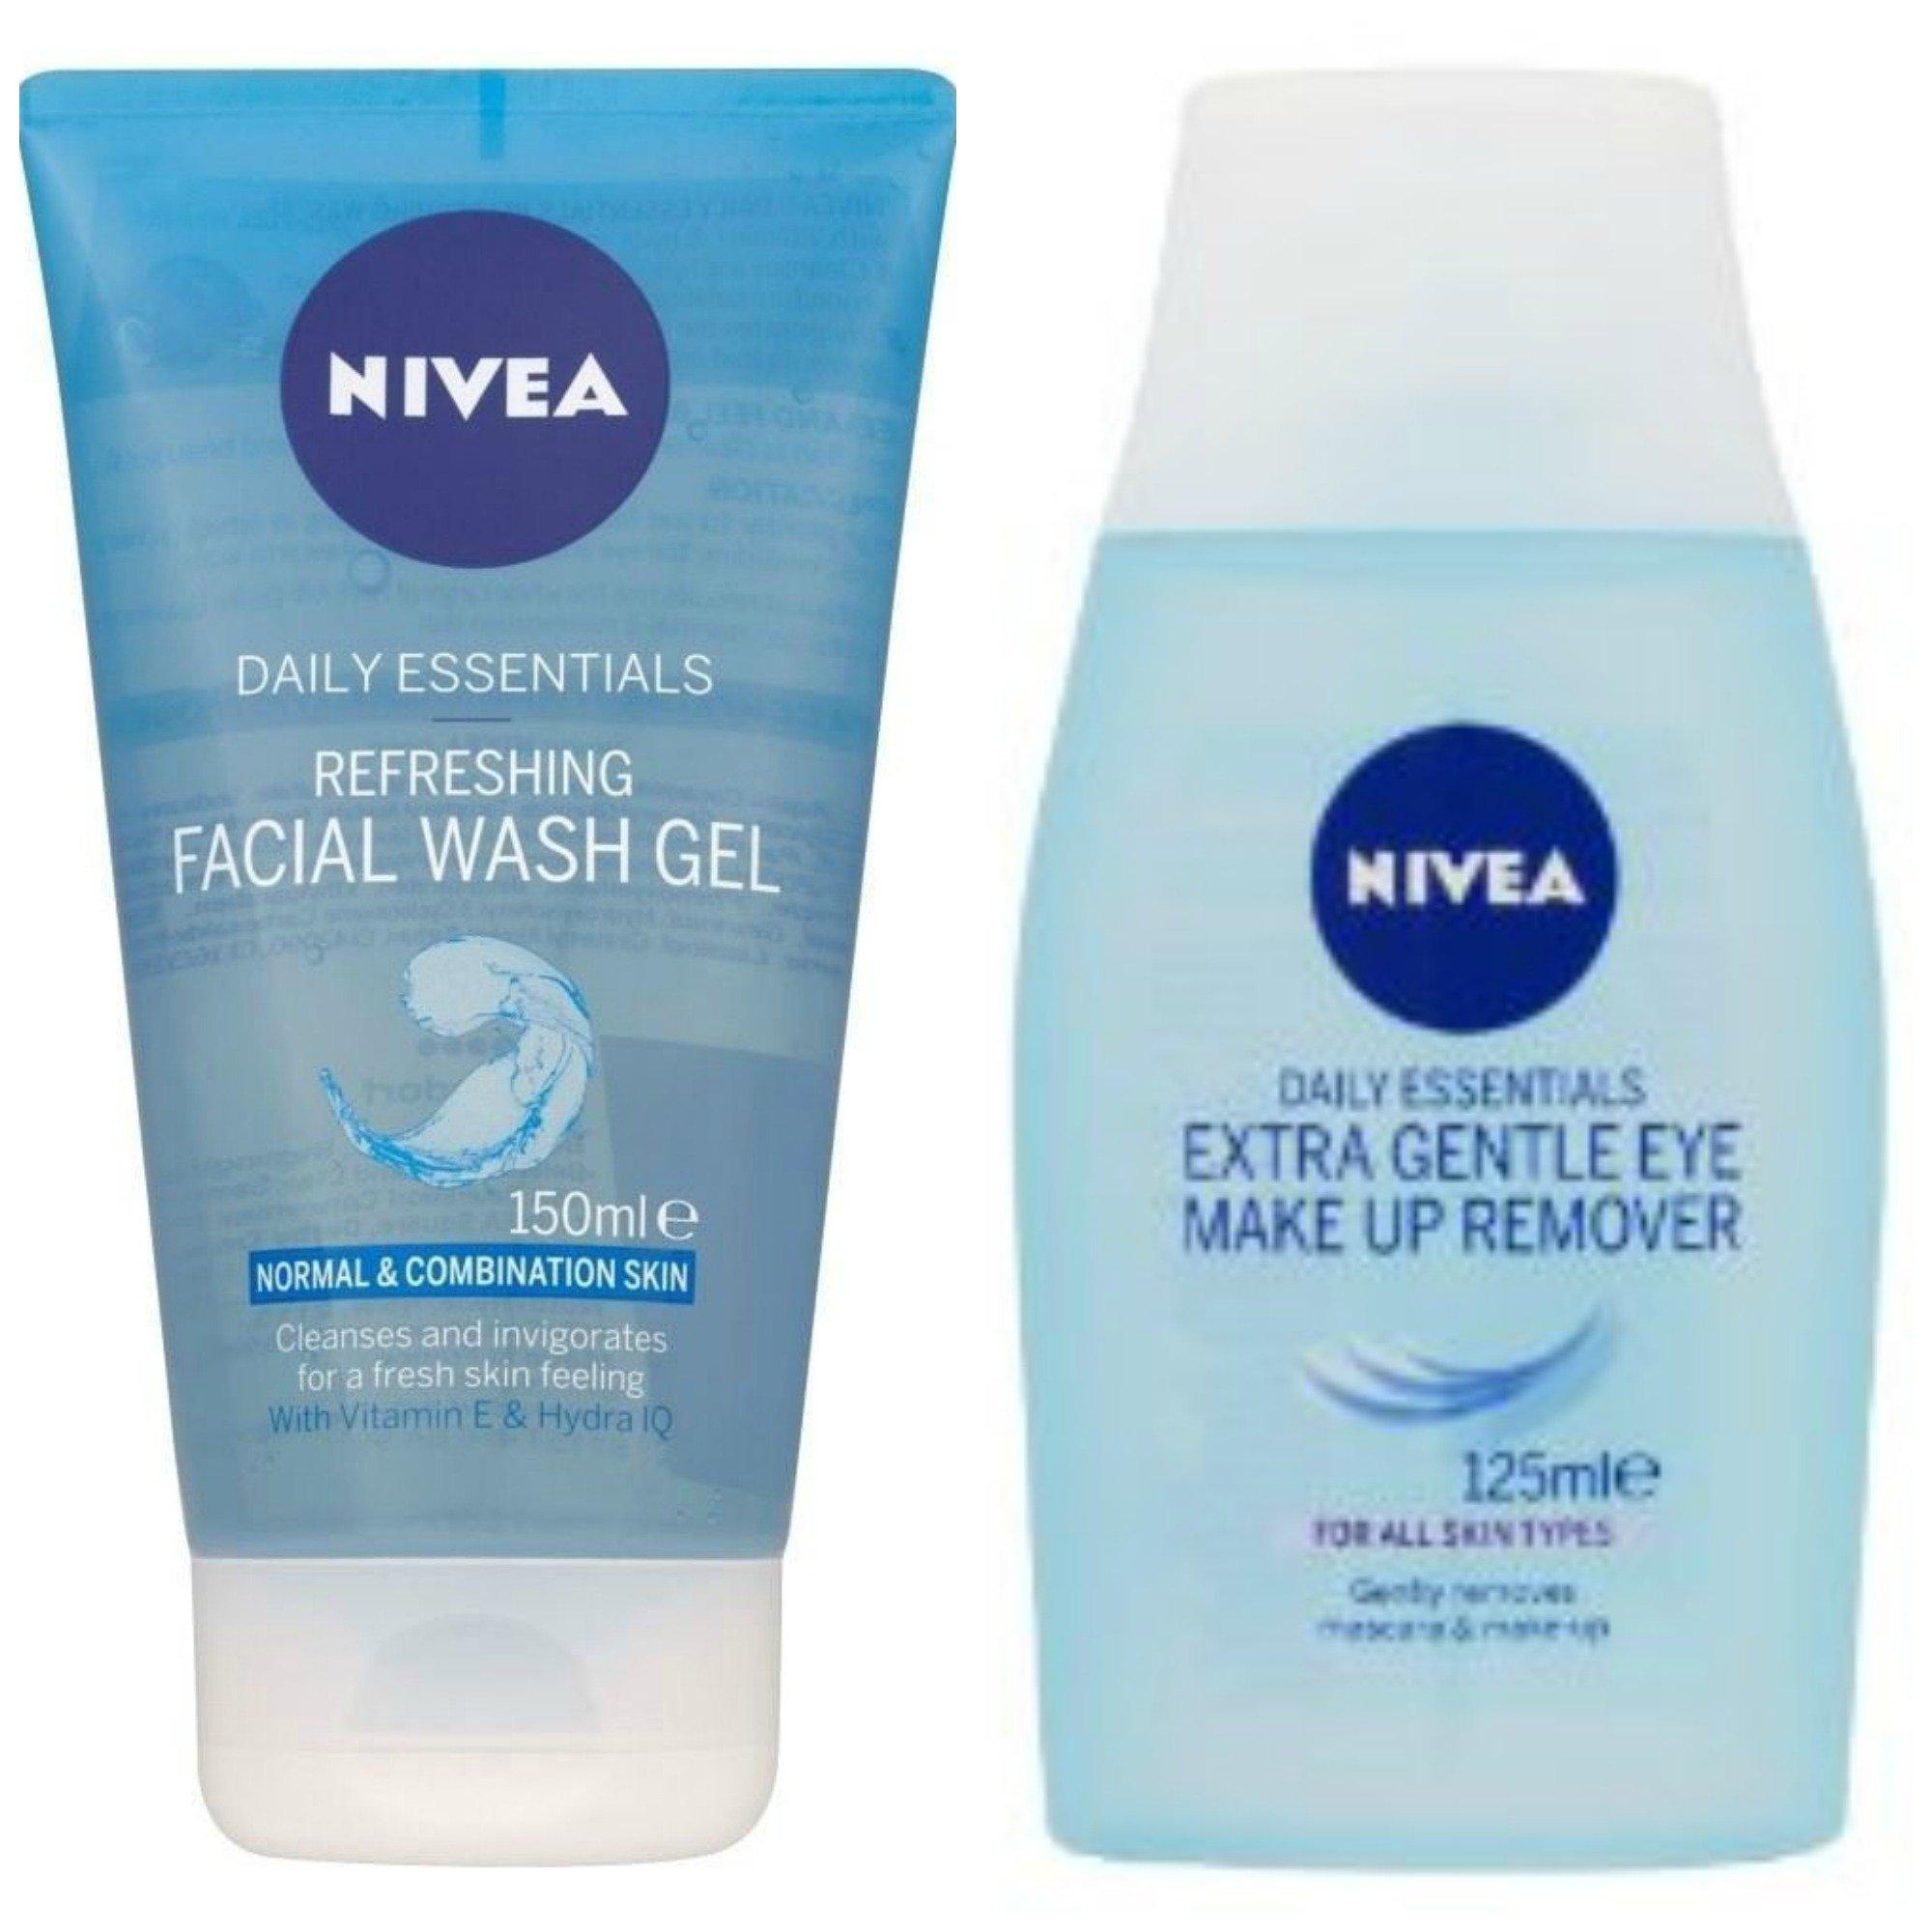 Nivea Visage Daily Essentials Refreshing Facial Wash Gel - Normal & Combination Skin (150ml) (Refreshing Facial Wash Gel + Eye Makeup Remover)